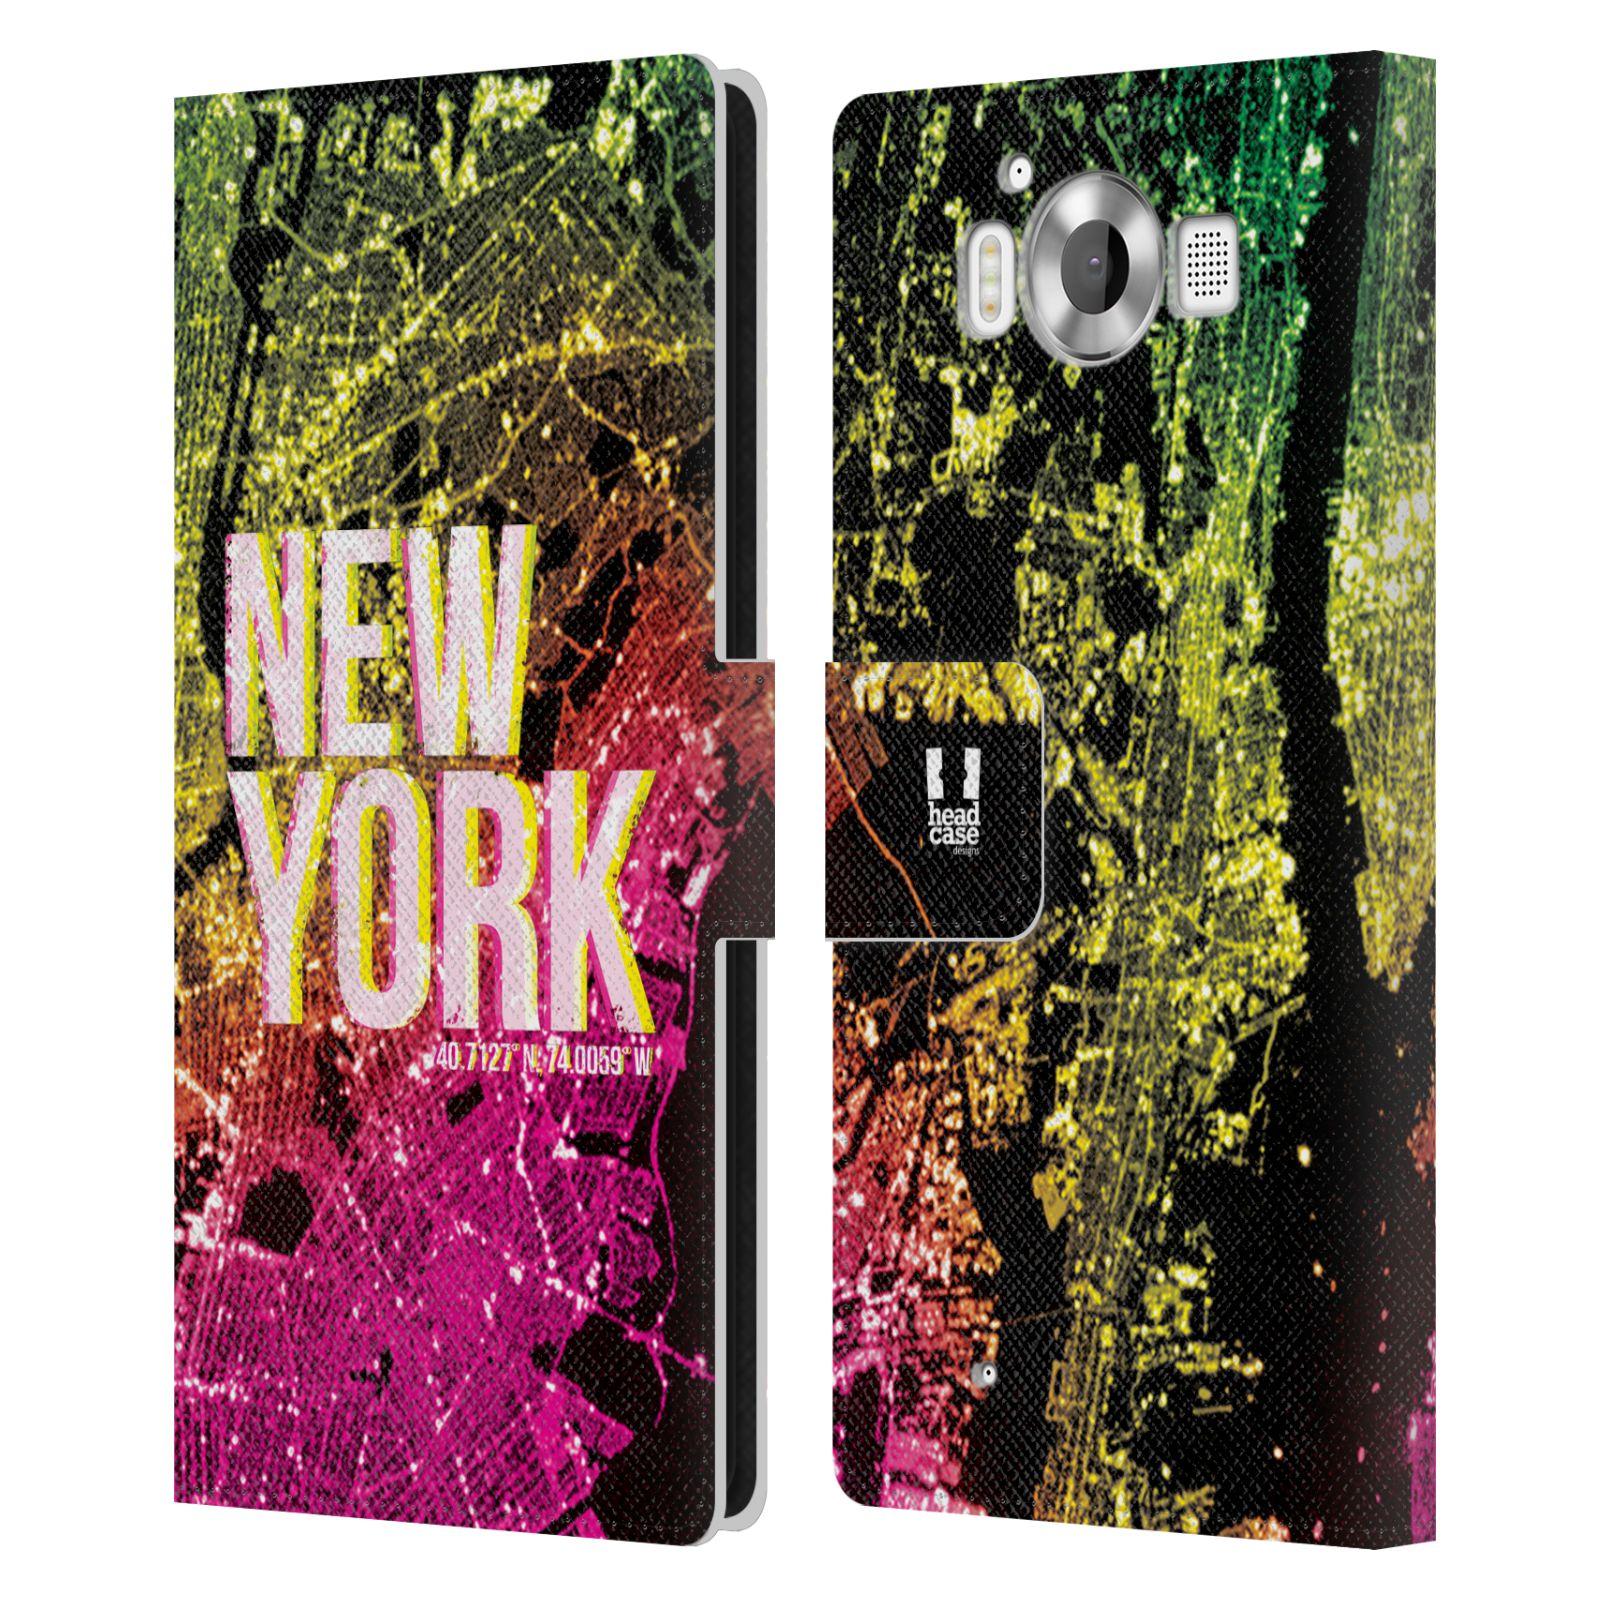 Pouzdro na mobil Nokia Lumia 950 - Head Case - NEW YORK pohled z vesmíru